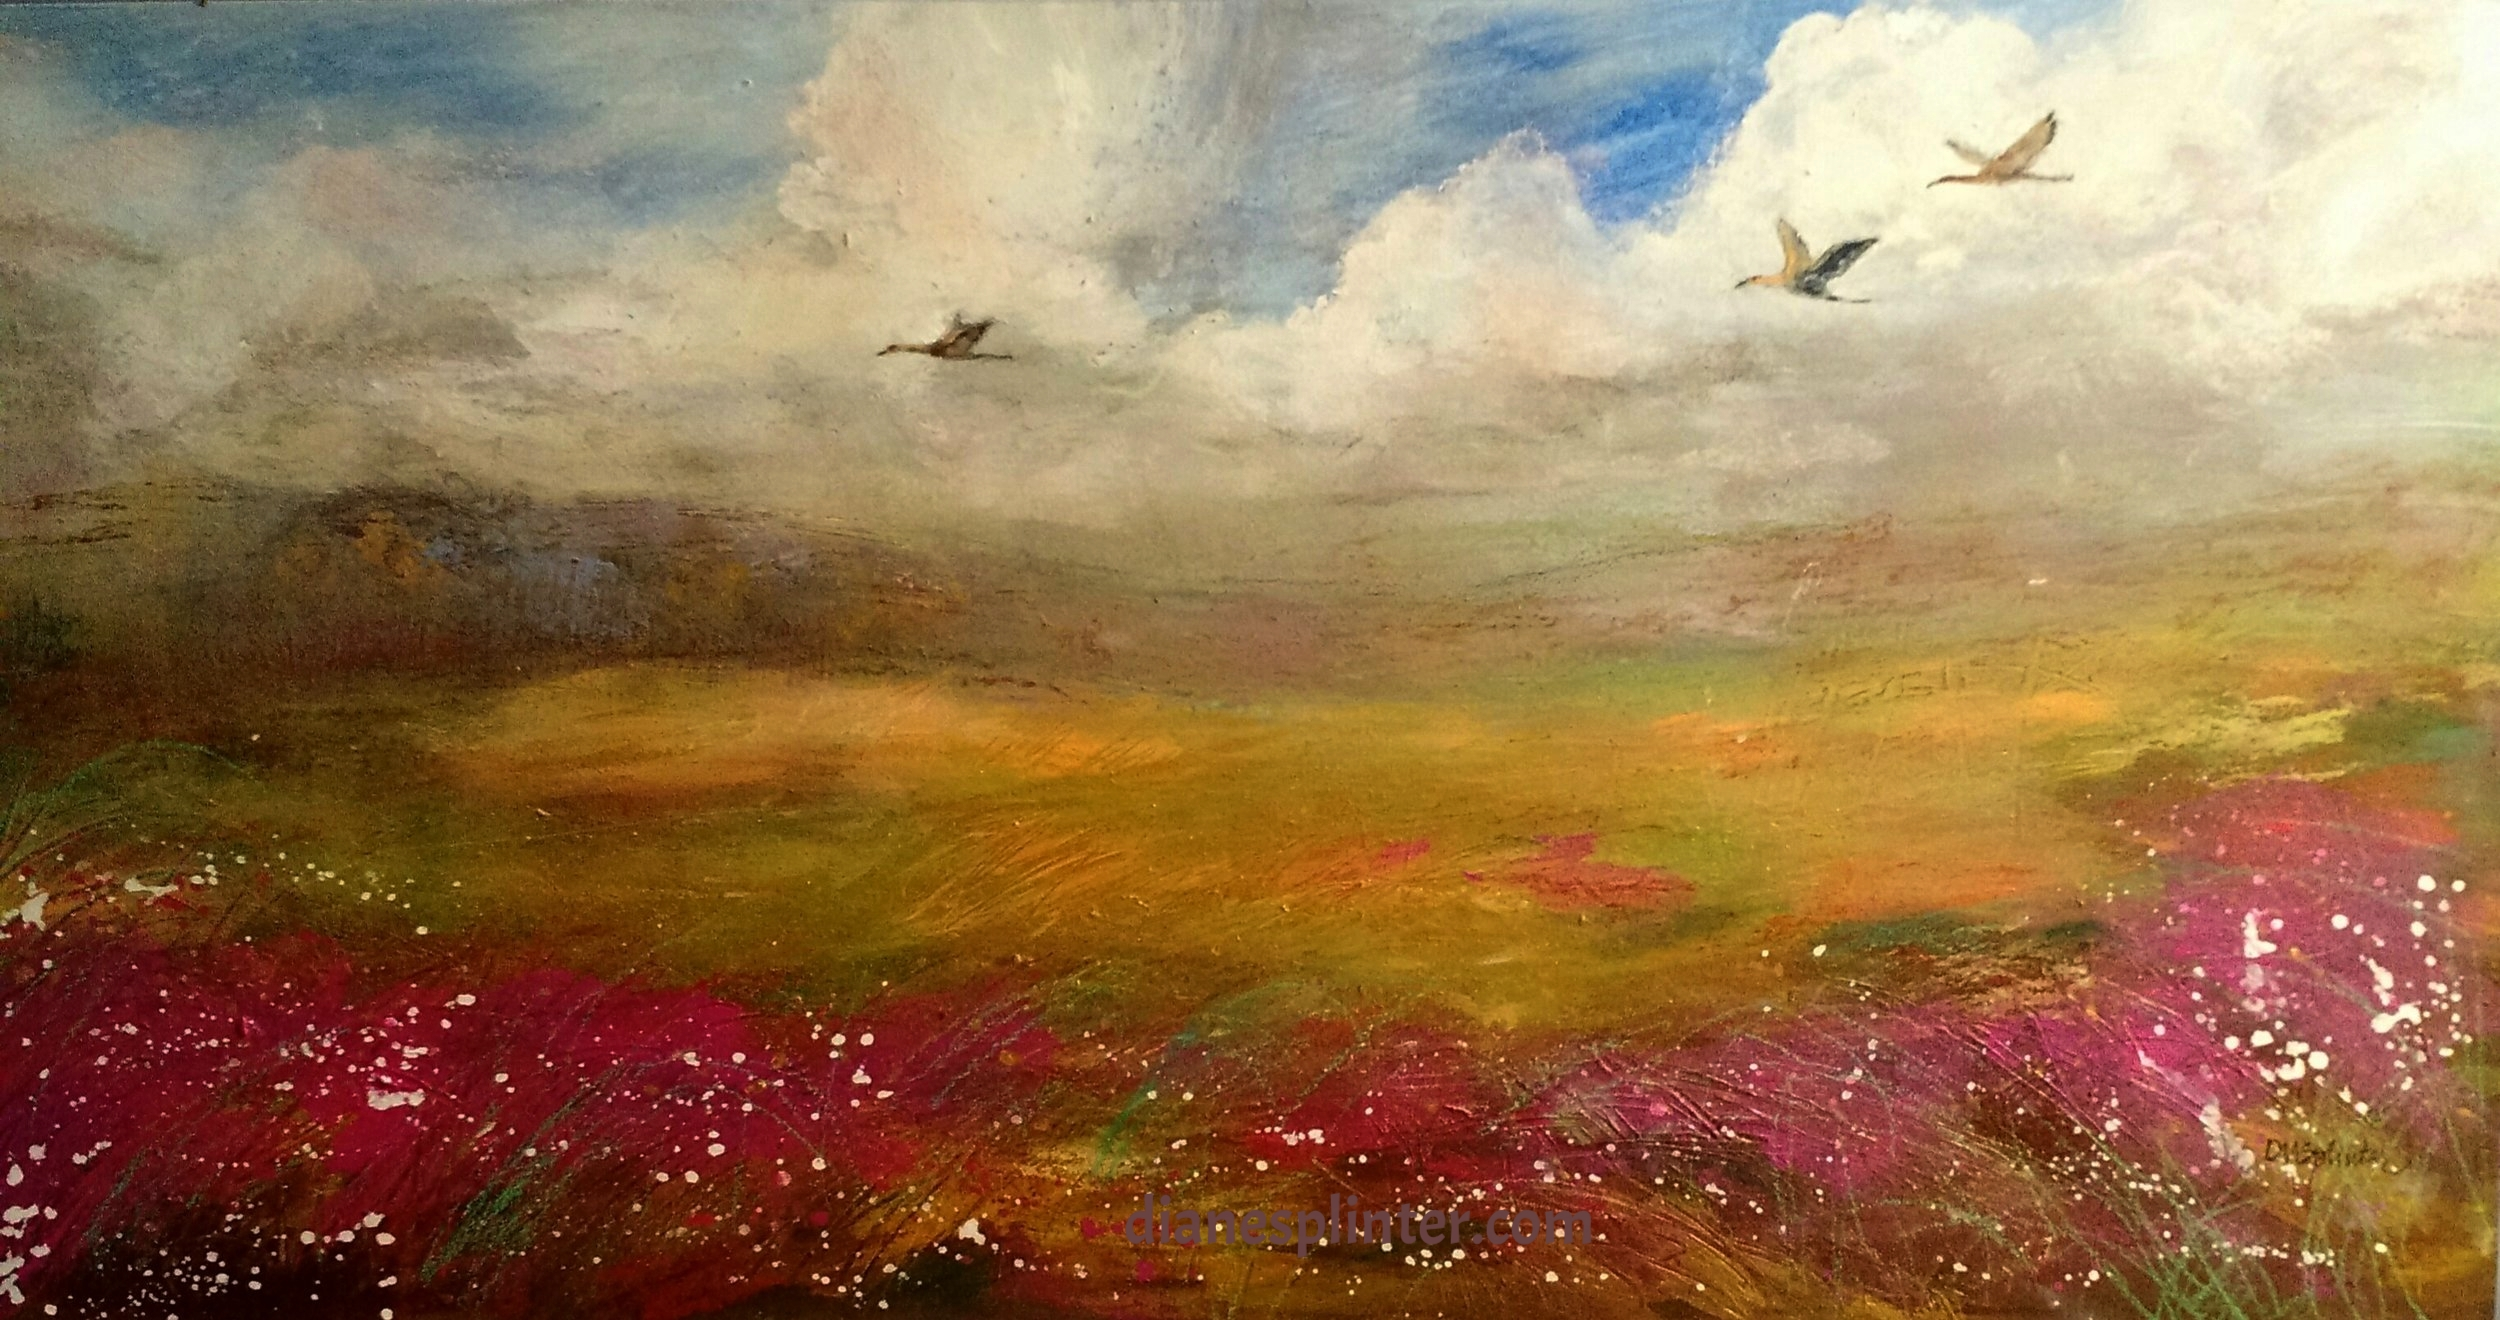 Flying High - Sandhill Cranes on birch board,  sold